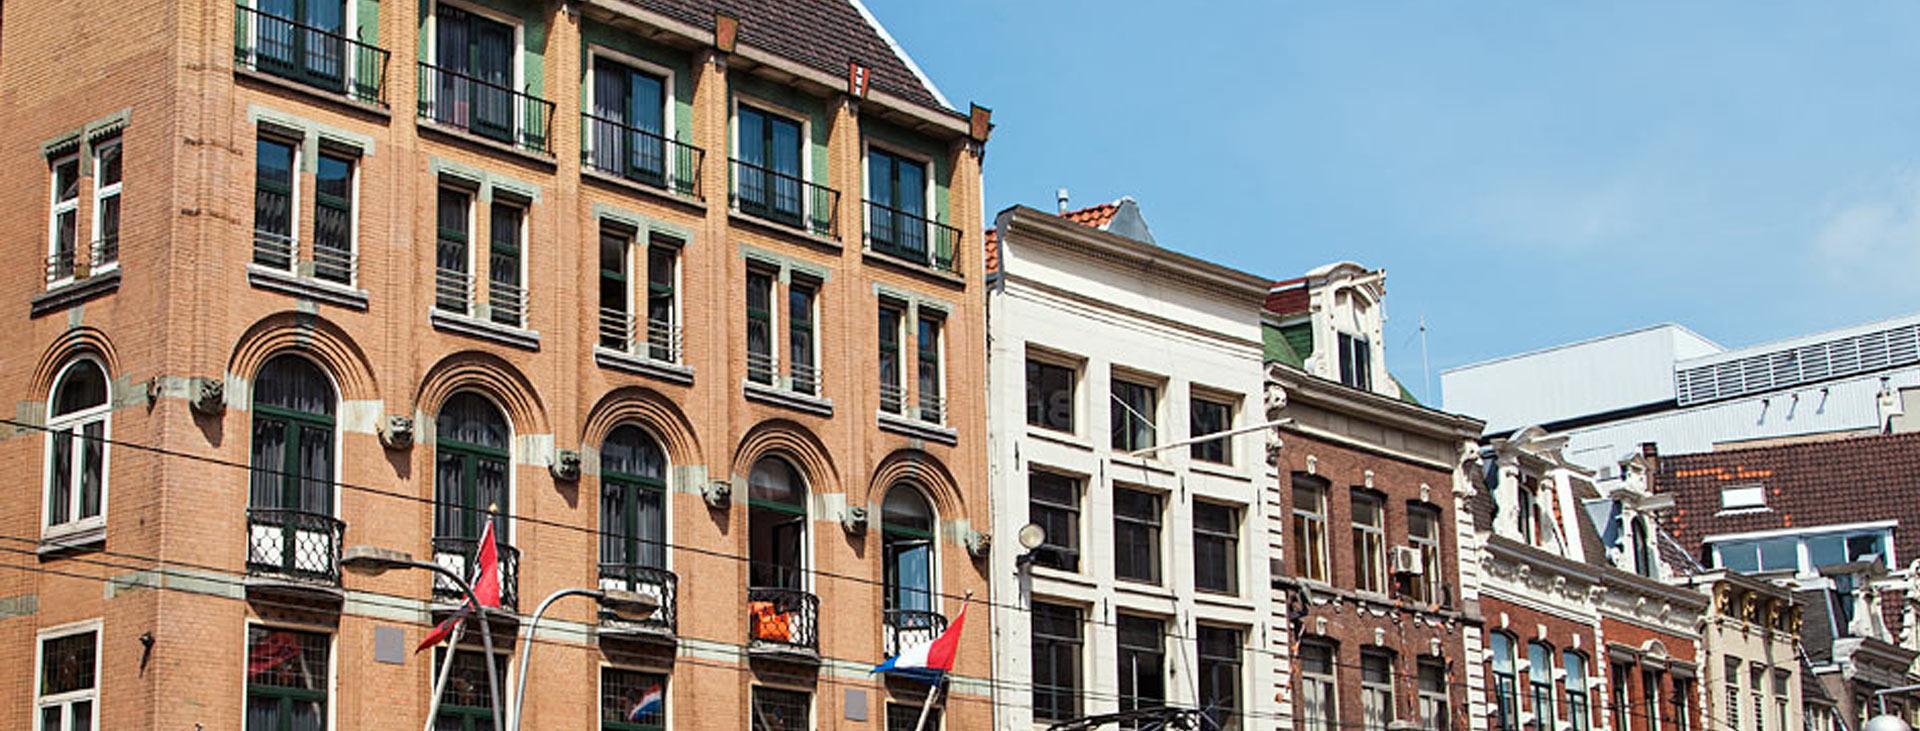 Amsterdam De Roode Leeuw, Amsterdam, Hollanti